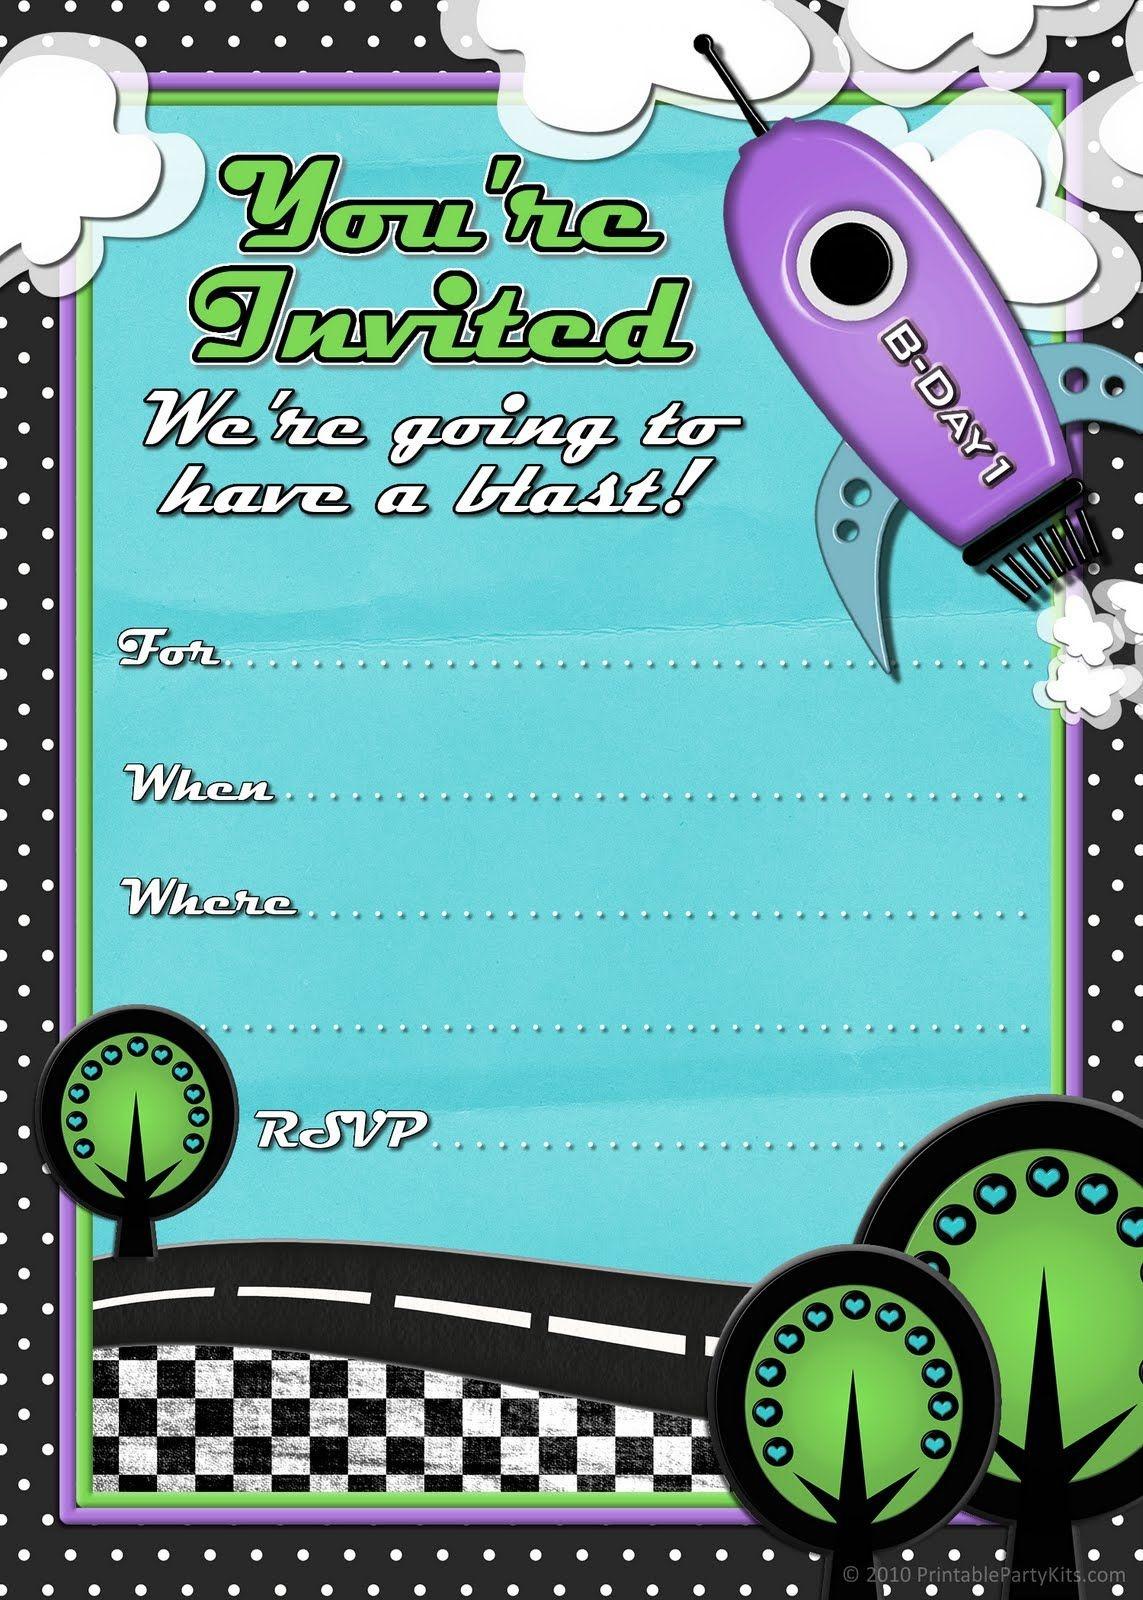 Free Printable Party Invitations: Rocket Ship Birthday Invites For - Free Printable Boy Birthday Invitations